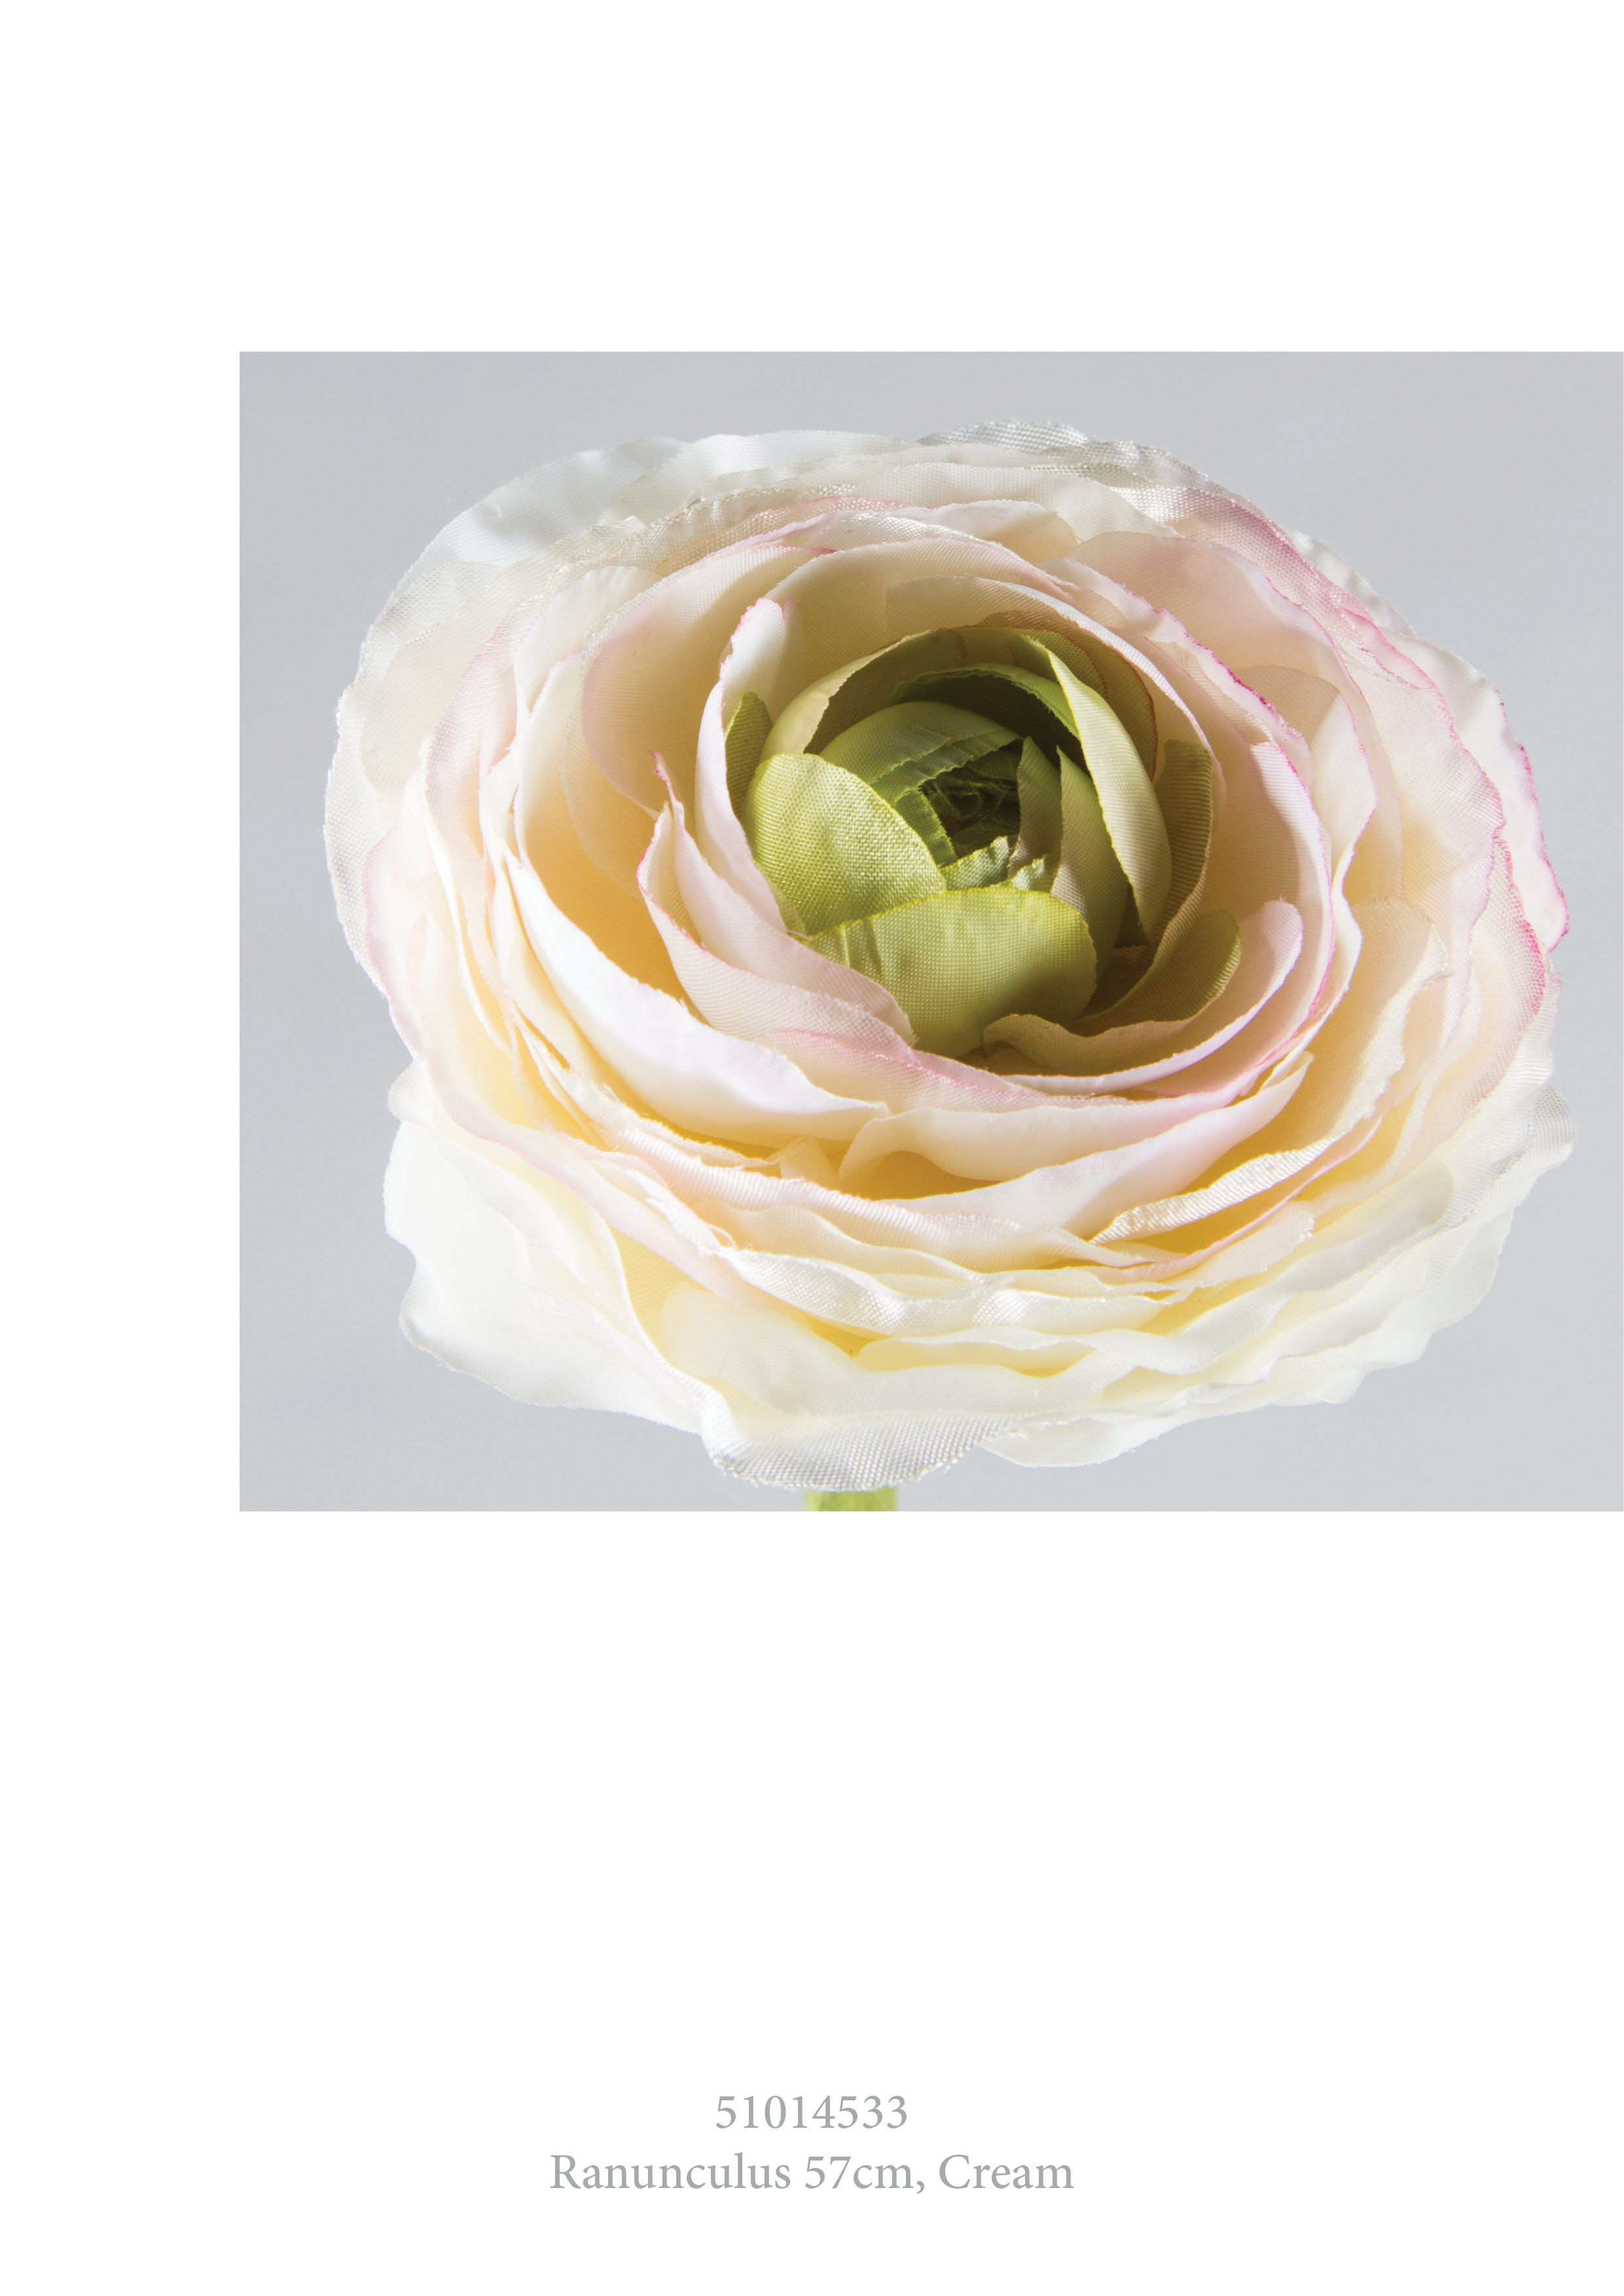 Ranunculus Cream ranunculus silkflowers materflora